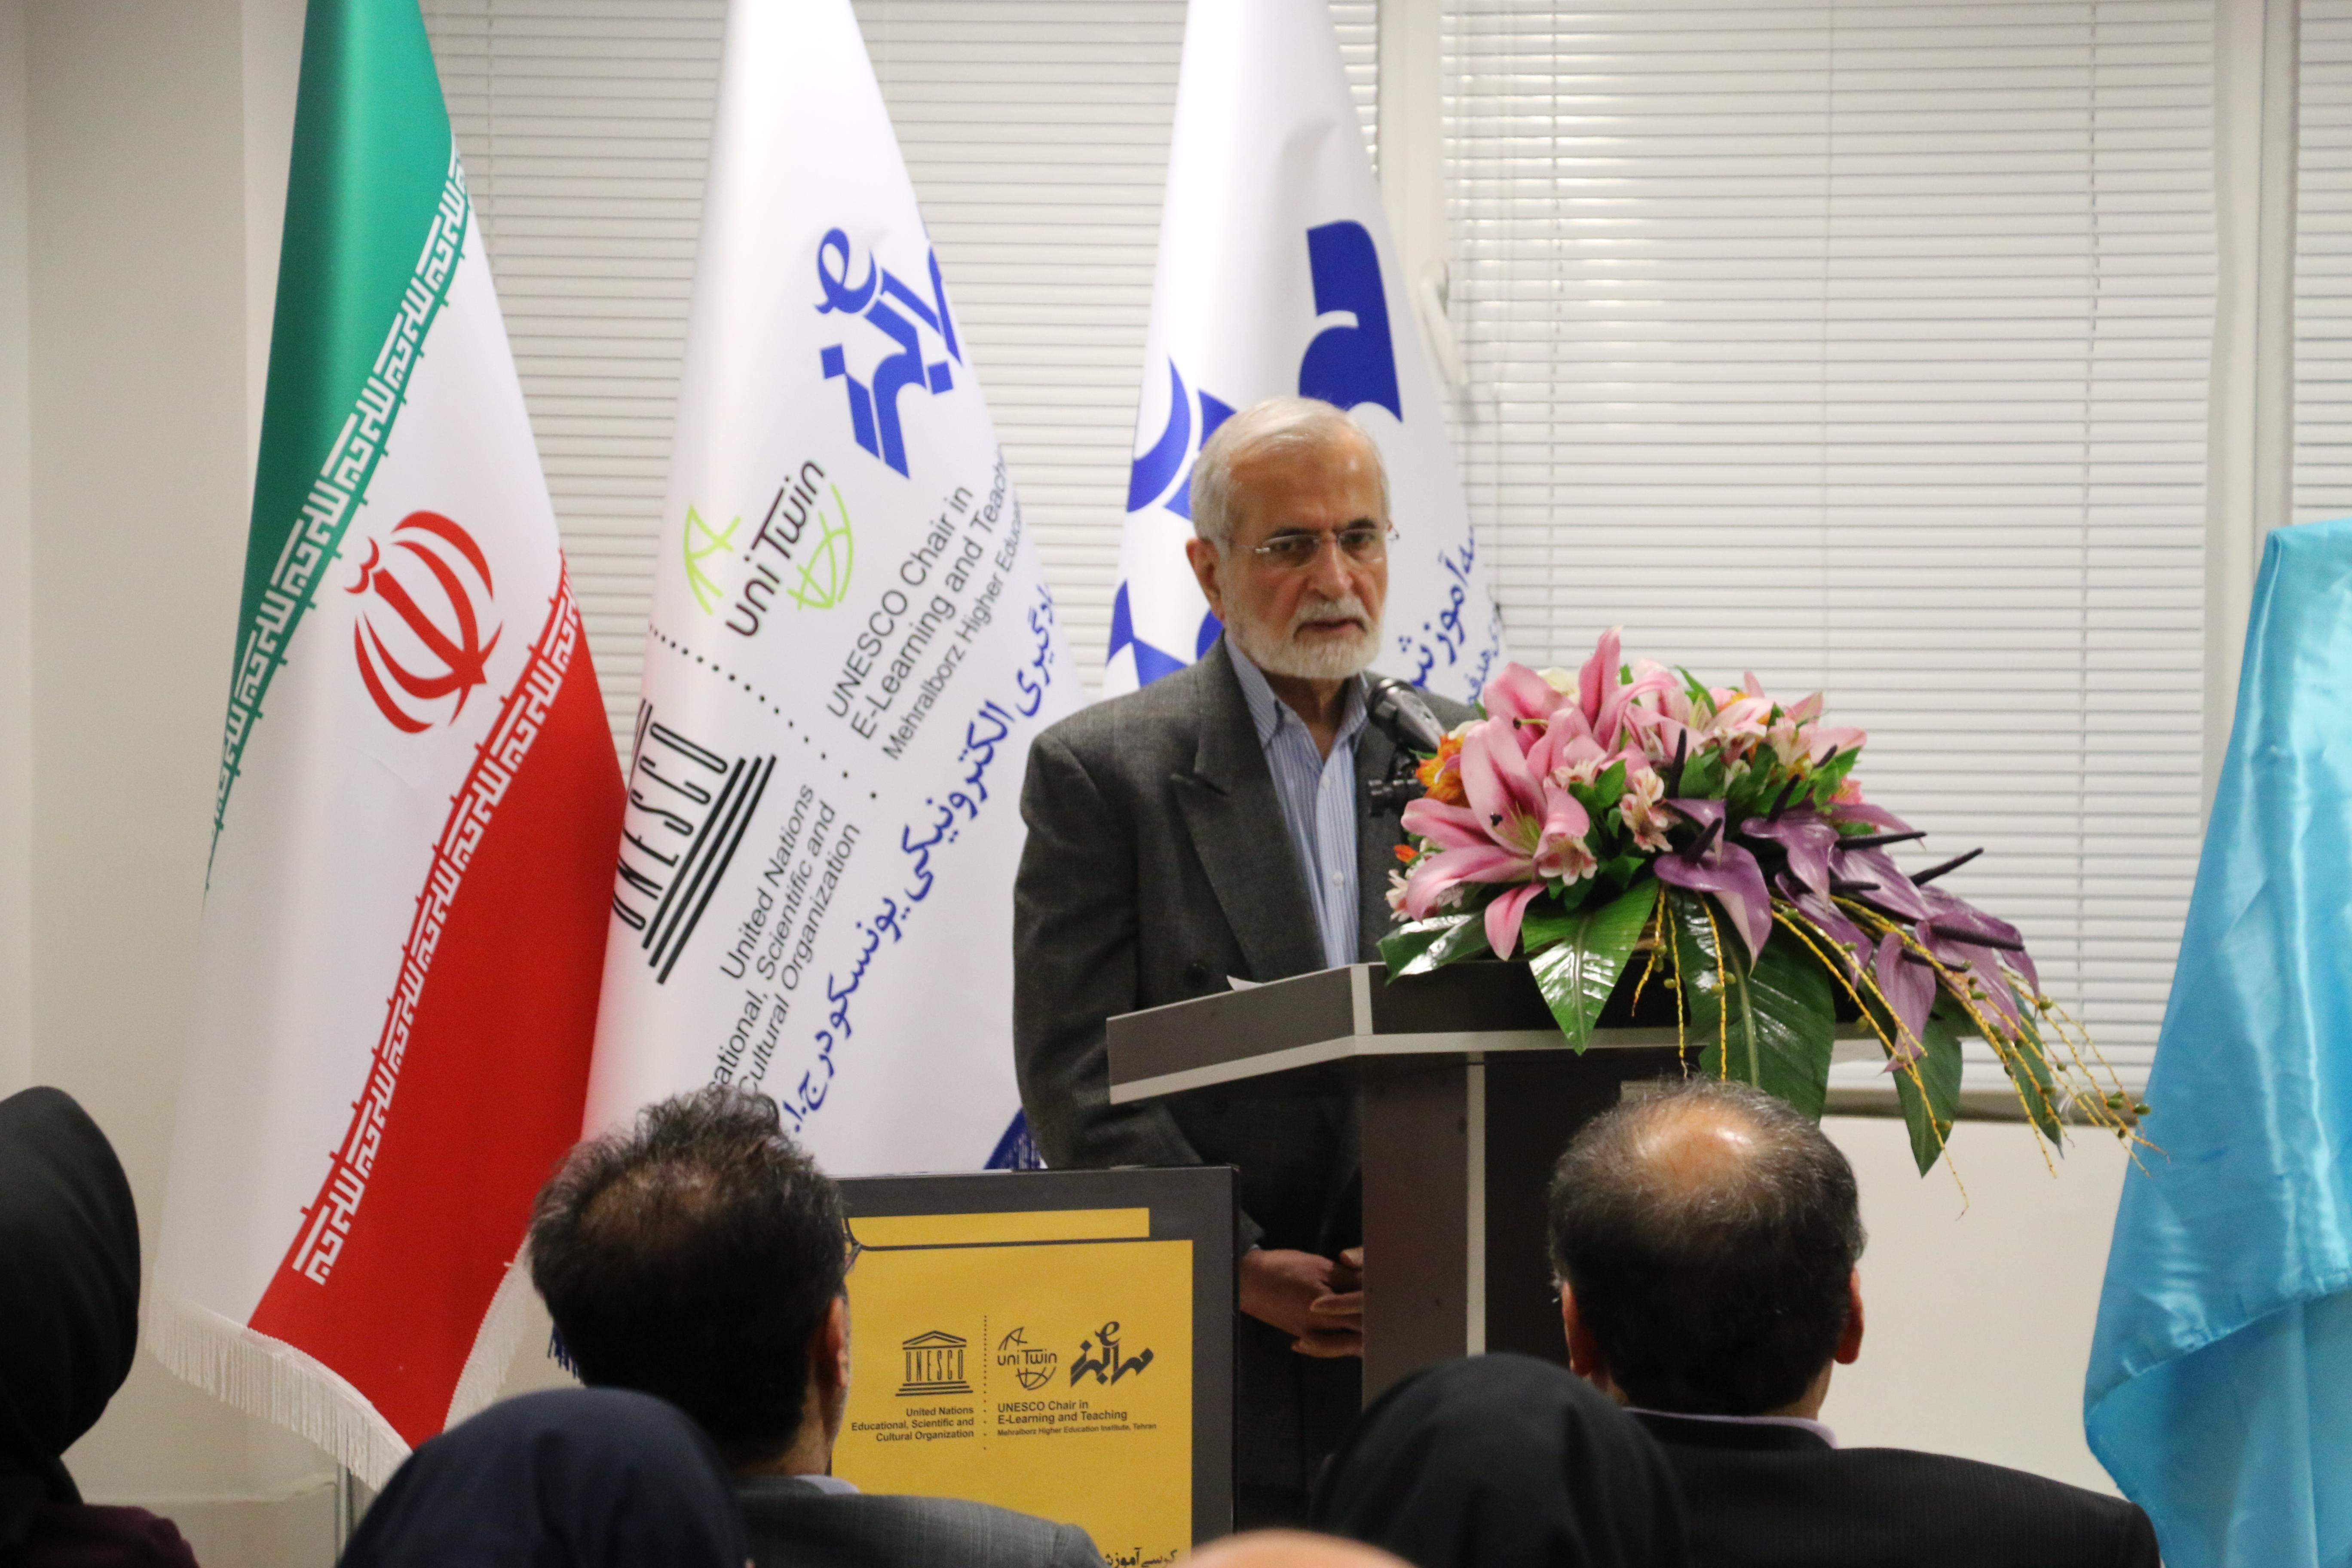 http://ucet.irسخنرانی جناب آقای دکتر کمال خرازی در مراسم افتتاح کرسی